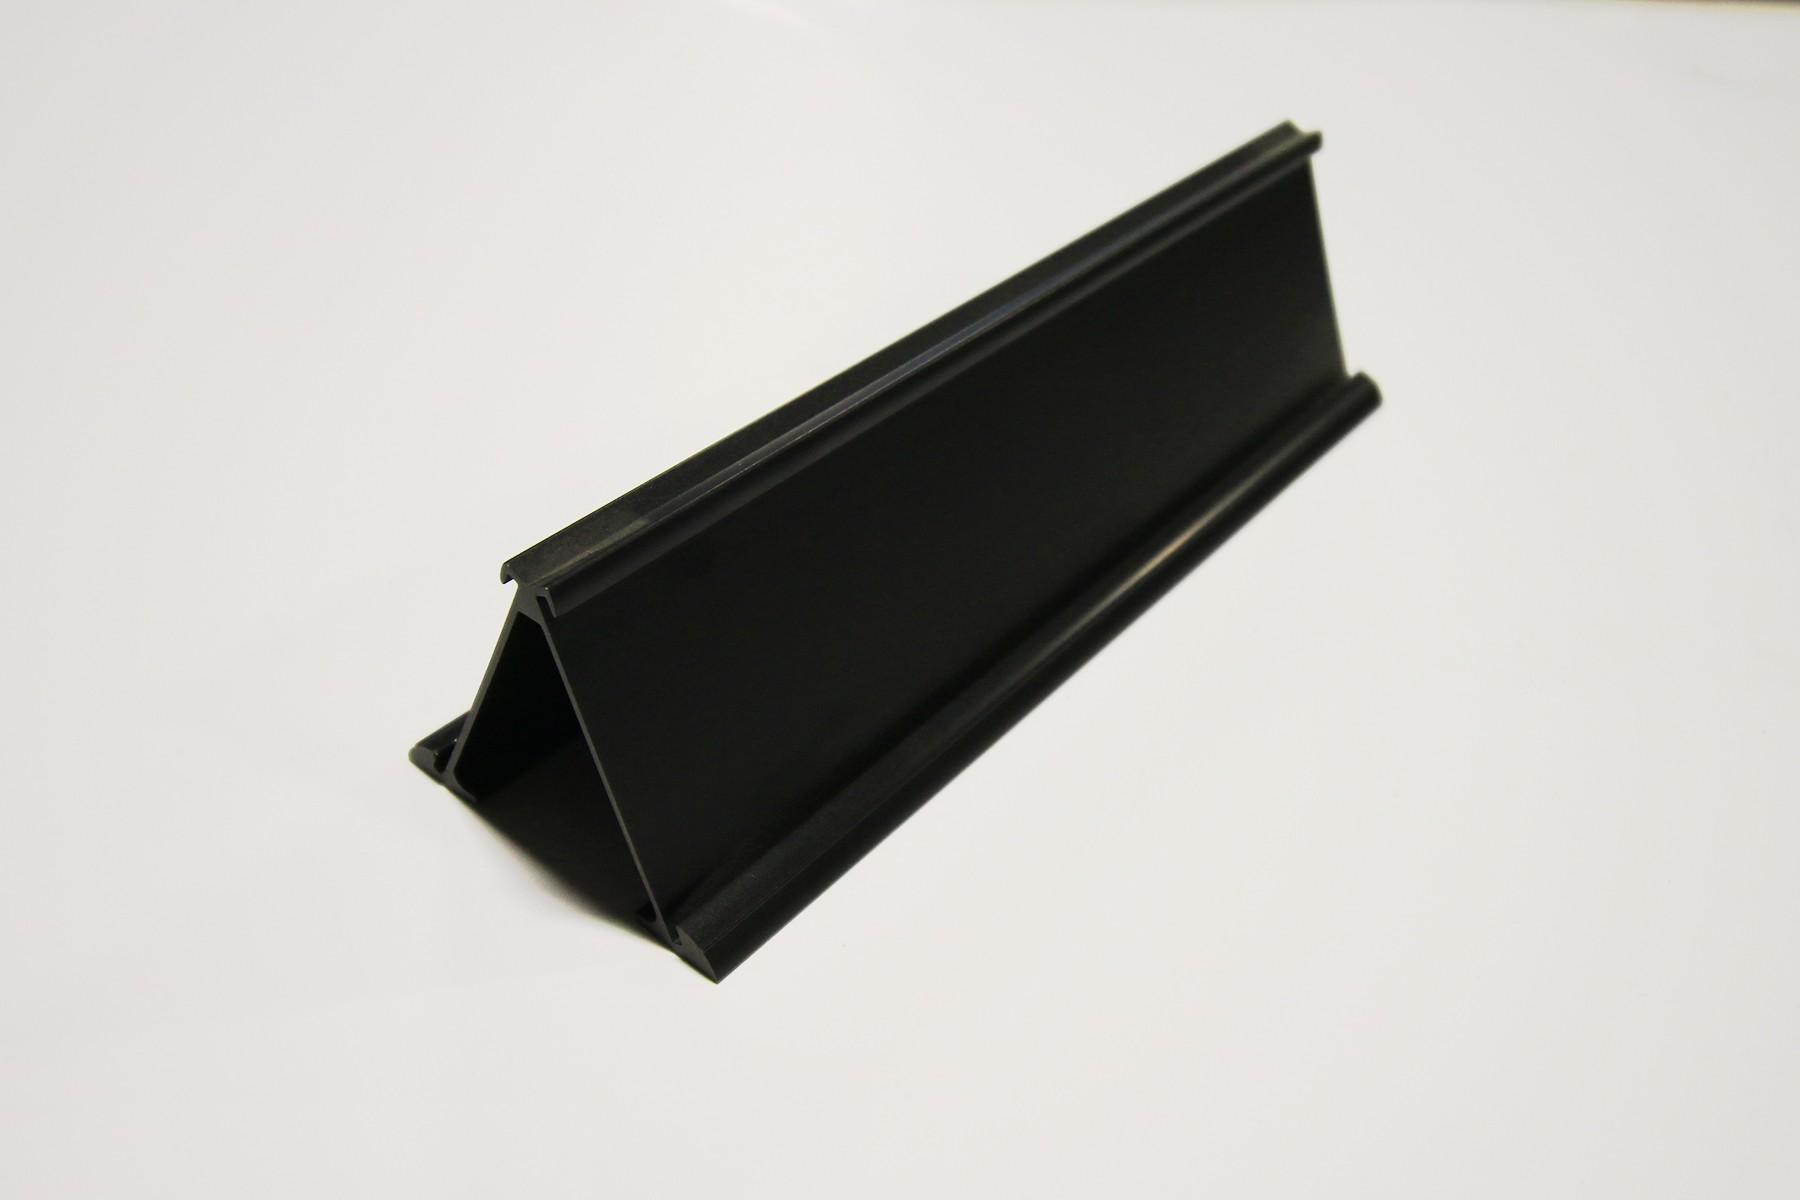 2 x 8 2-Sided Desk Holder, Black